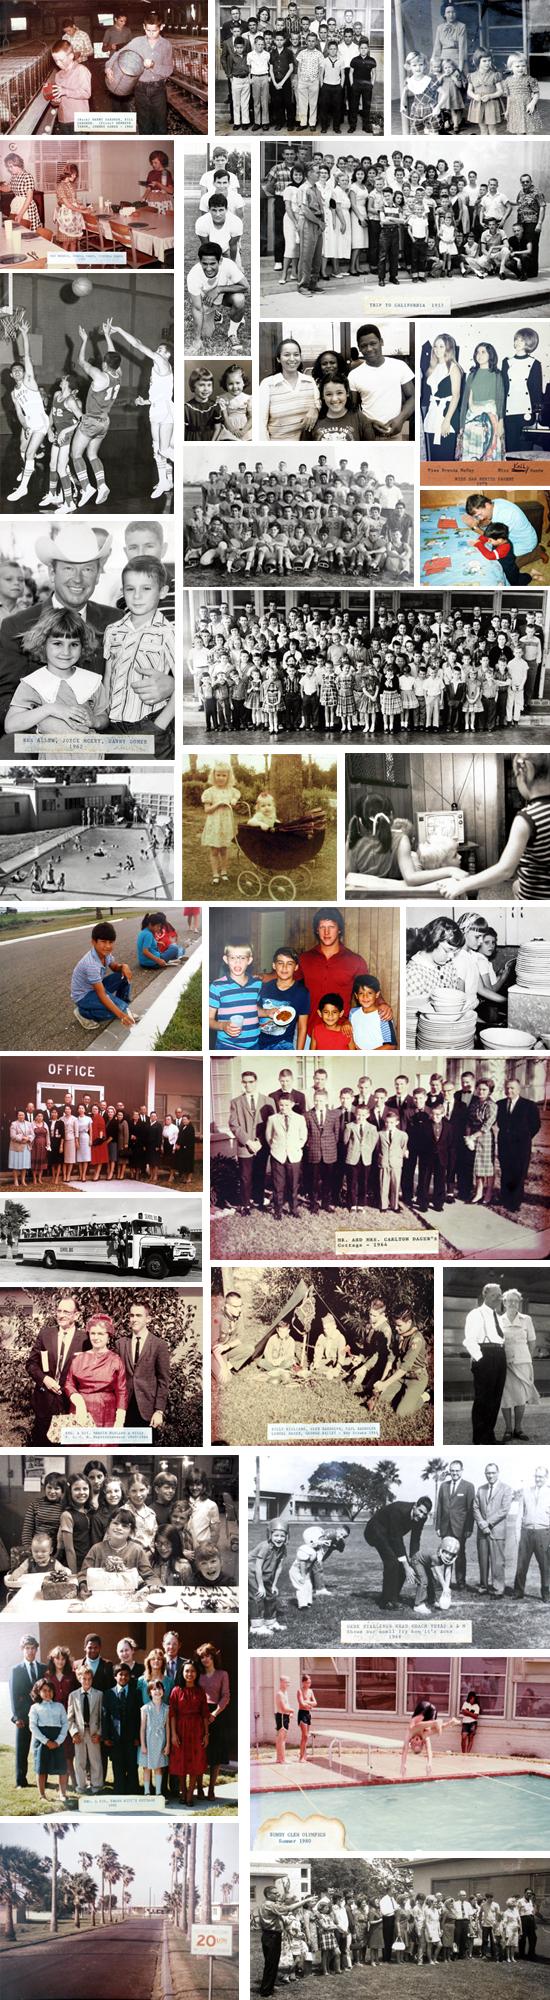 photoshistory.jpg